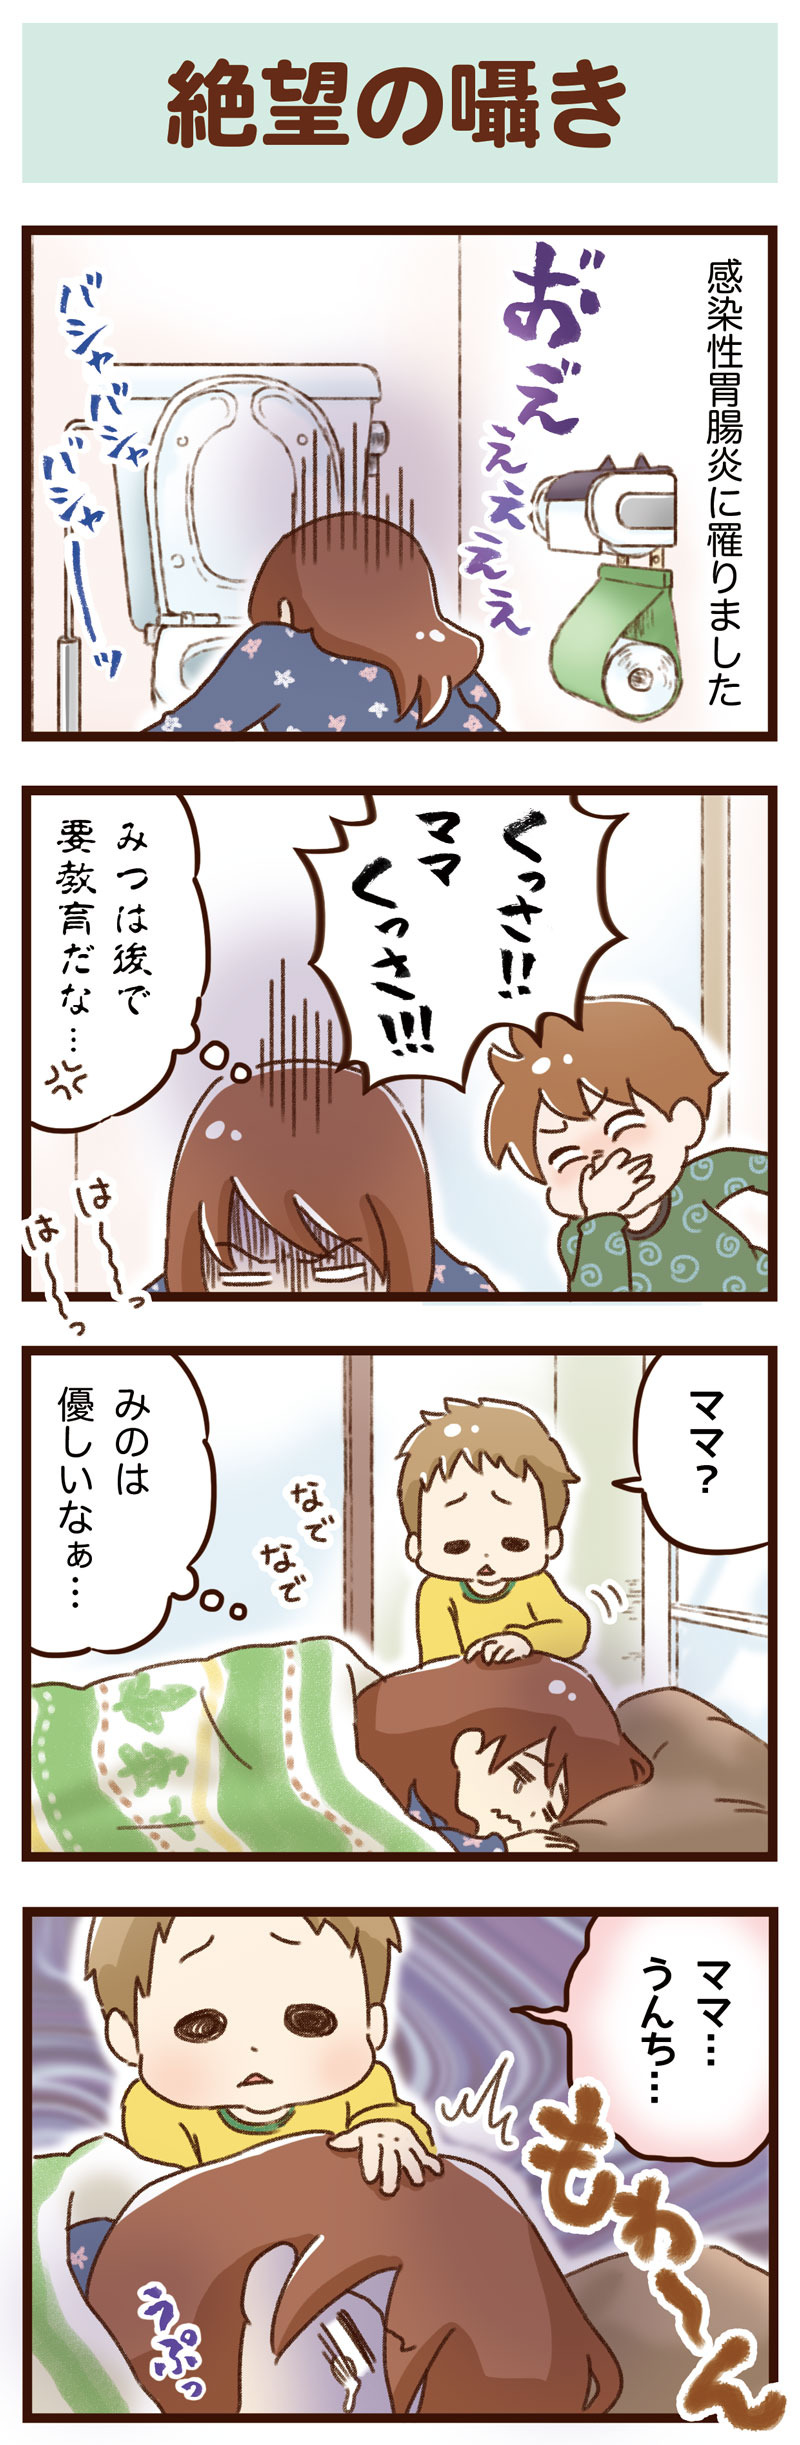 yumui271-1